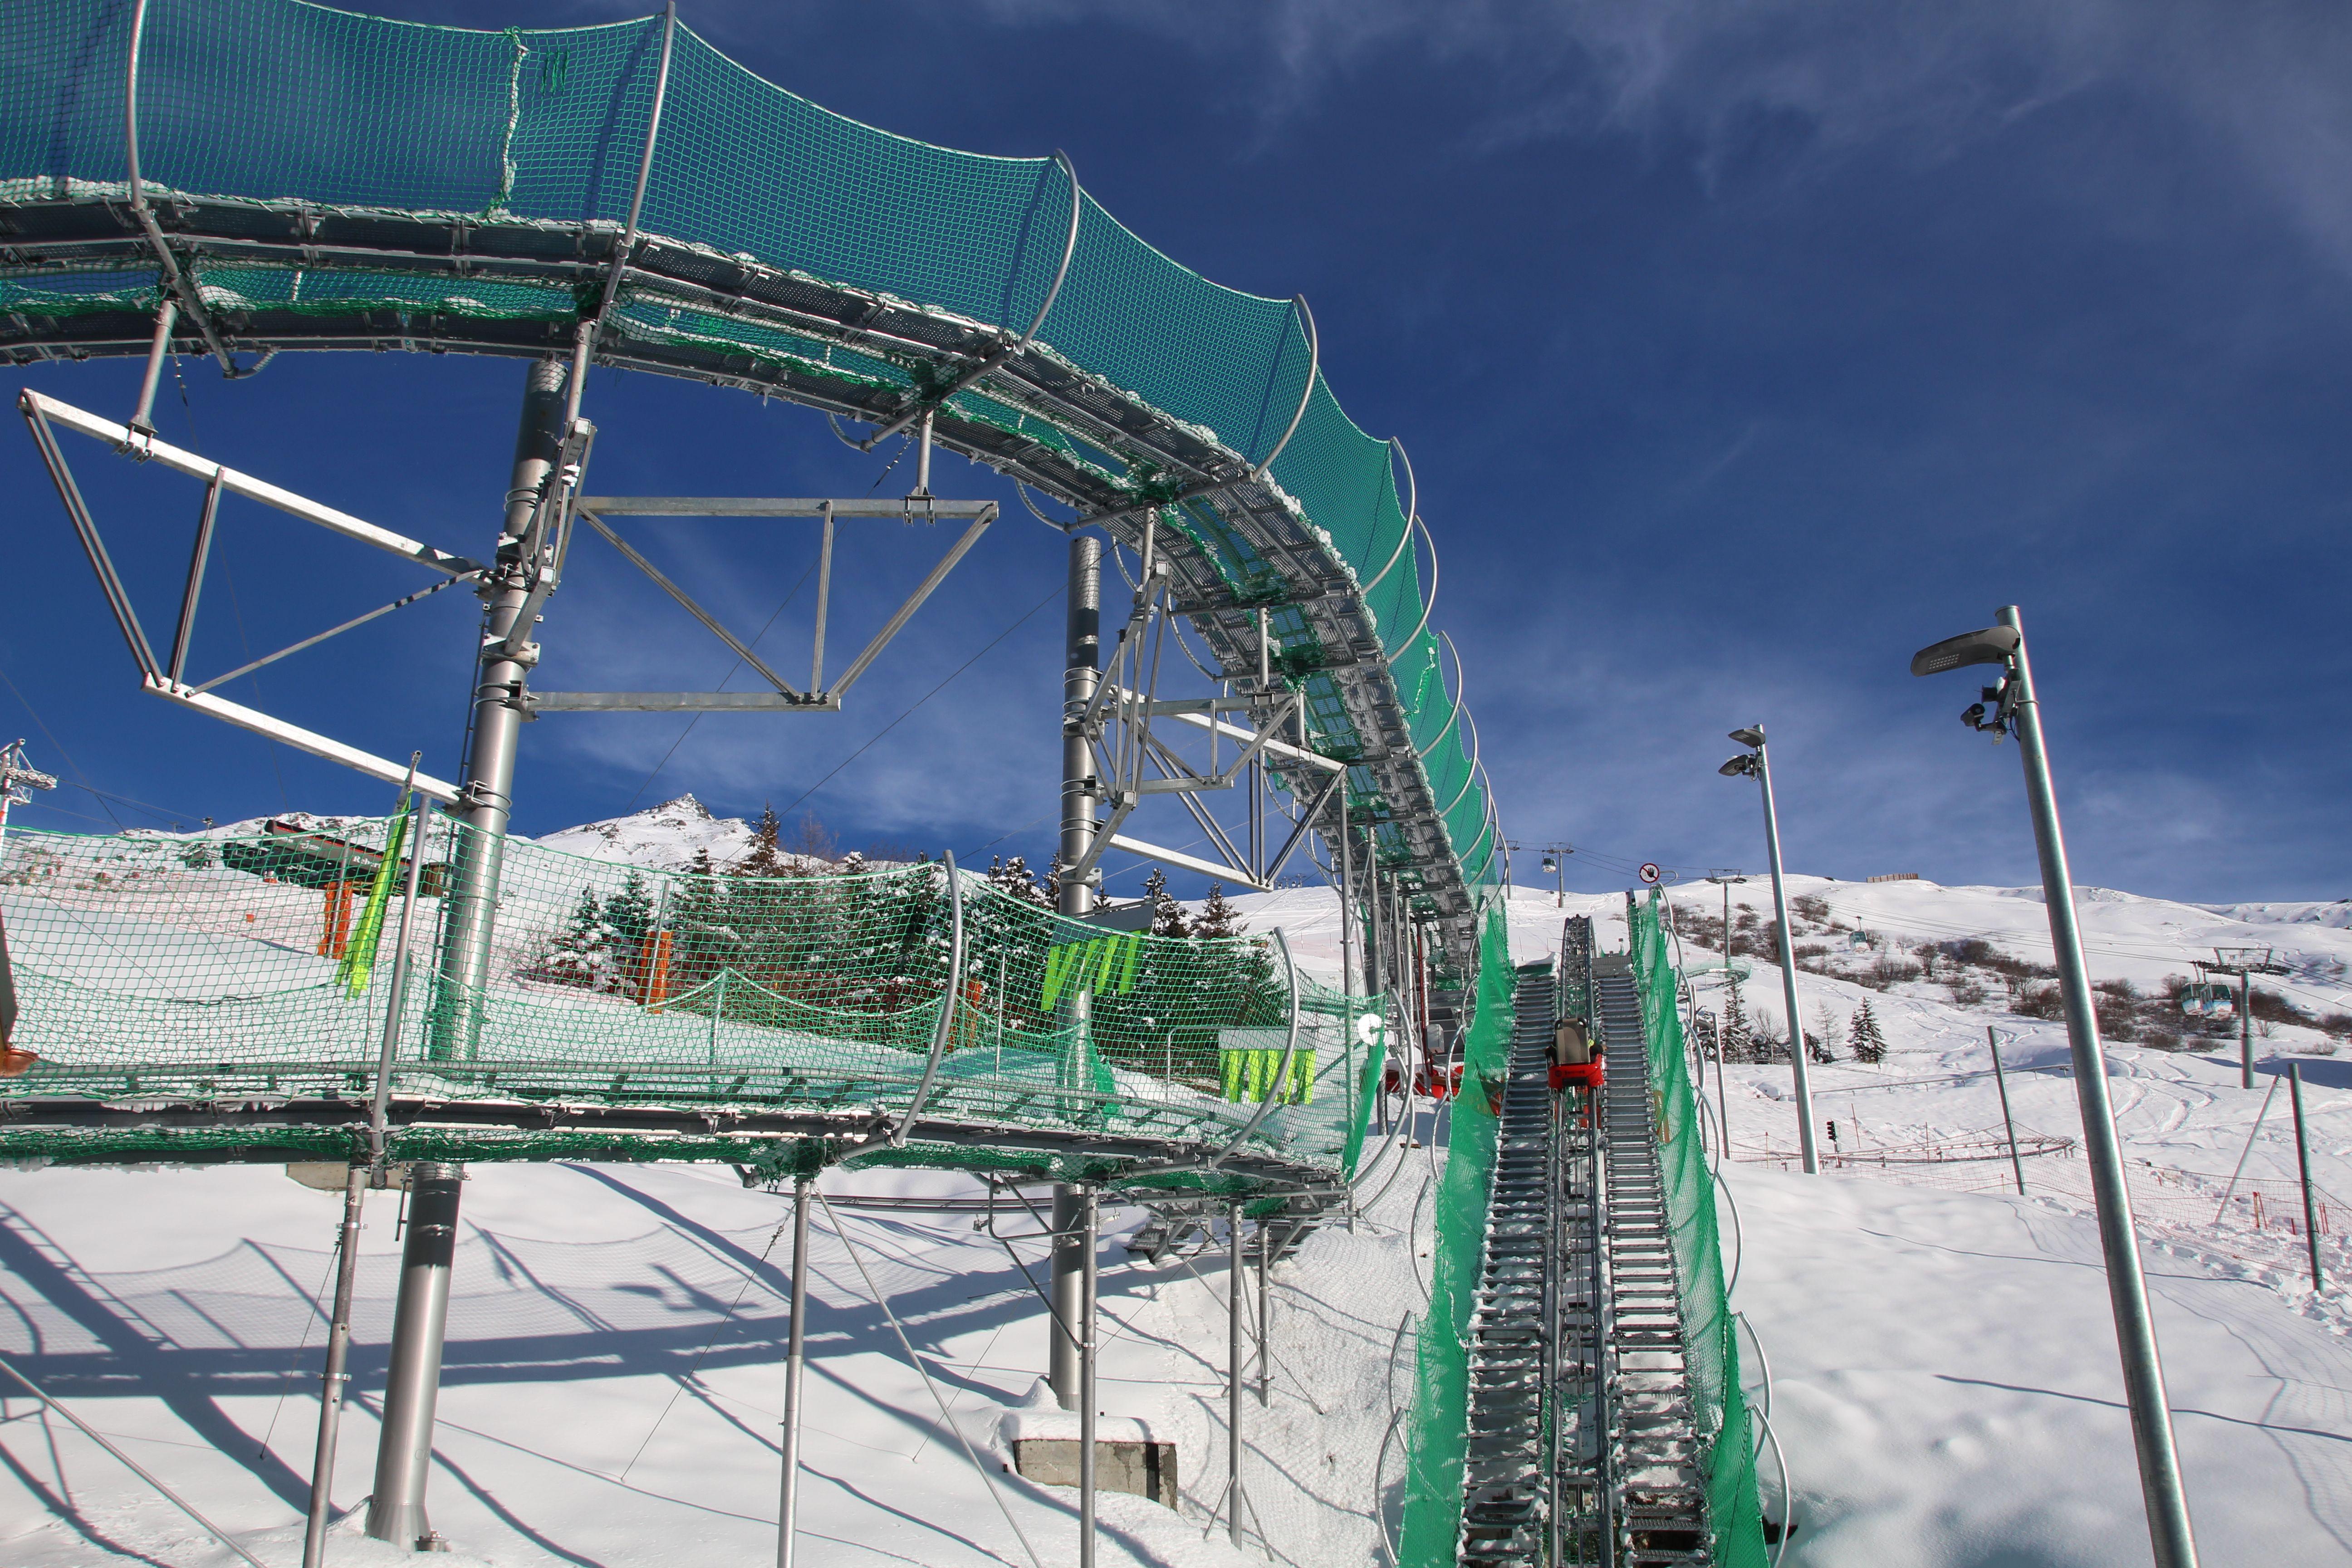 Speed Mountain Luge Sur Rails Ouverte Hiver Et Ete Luge Winter Activities Skiing